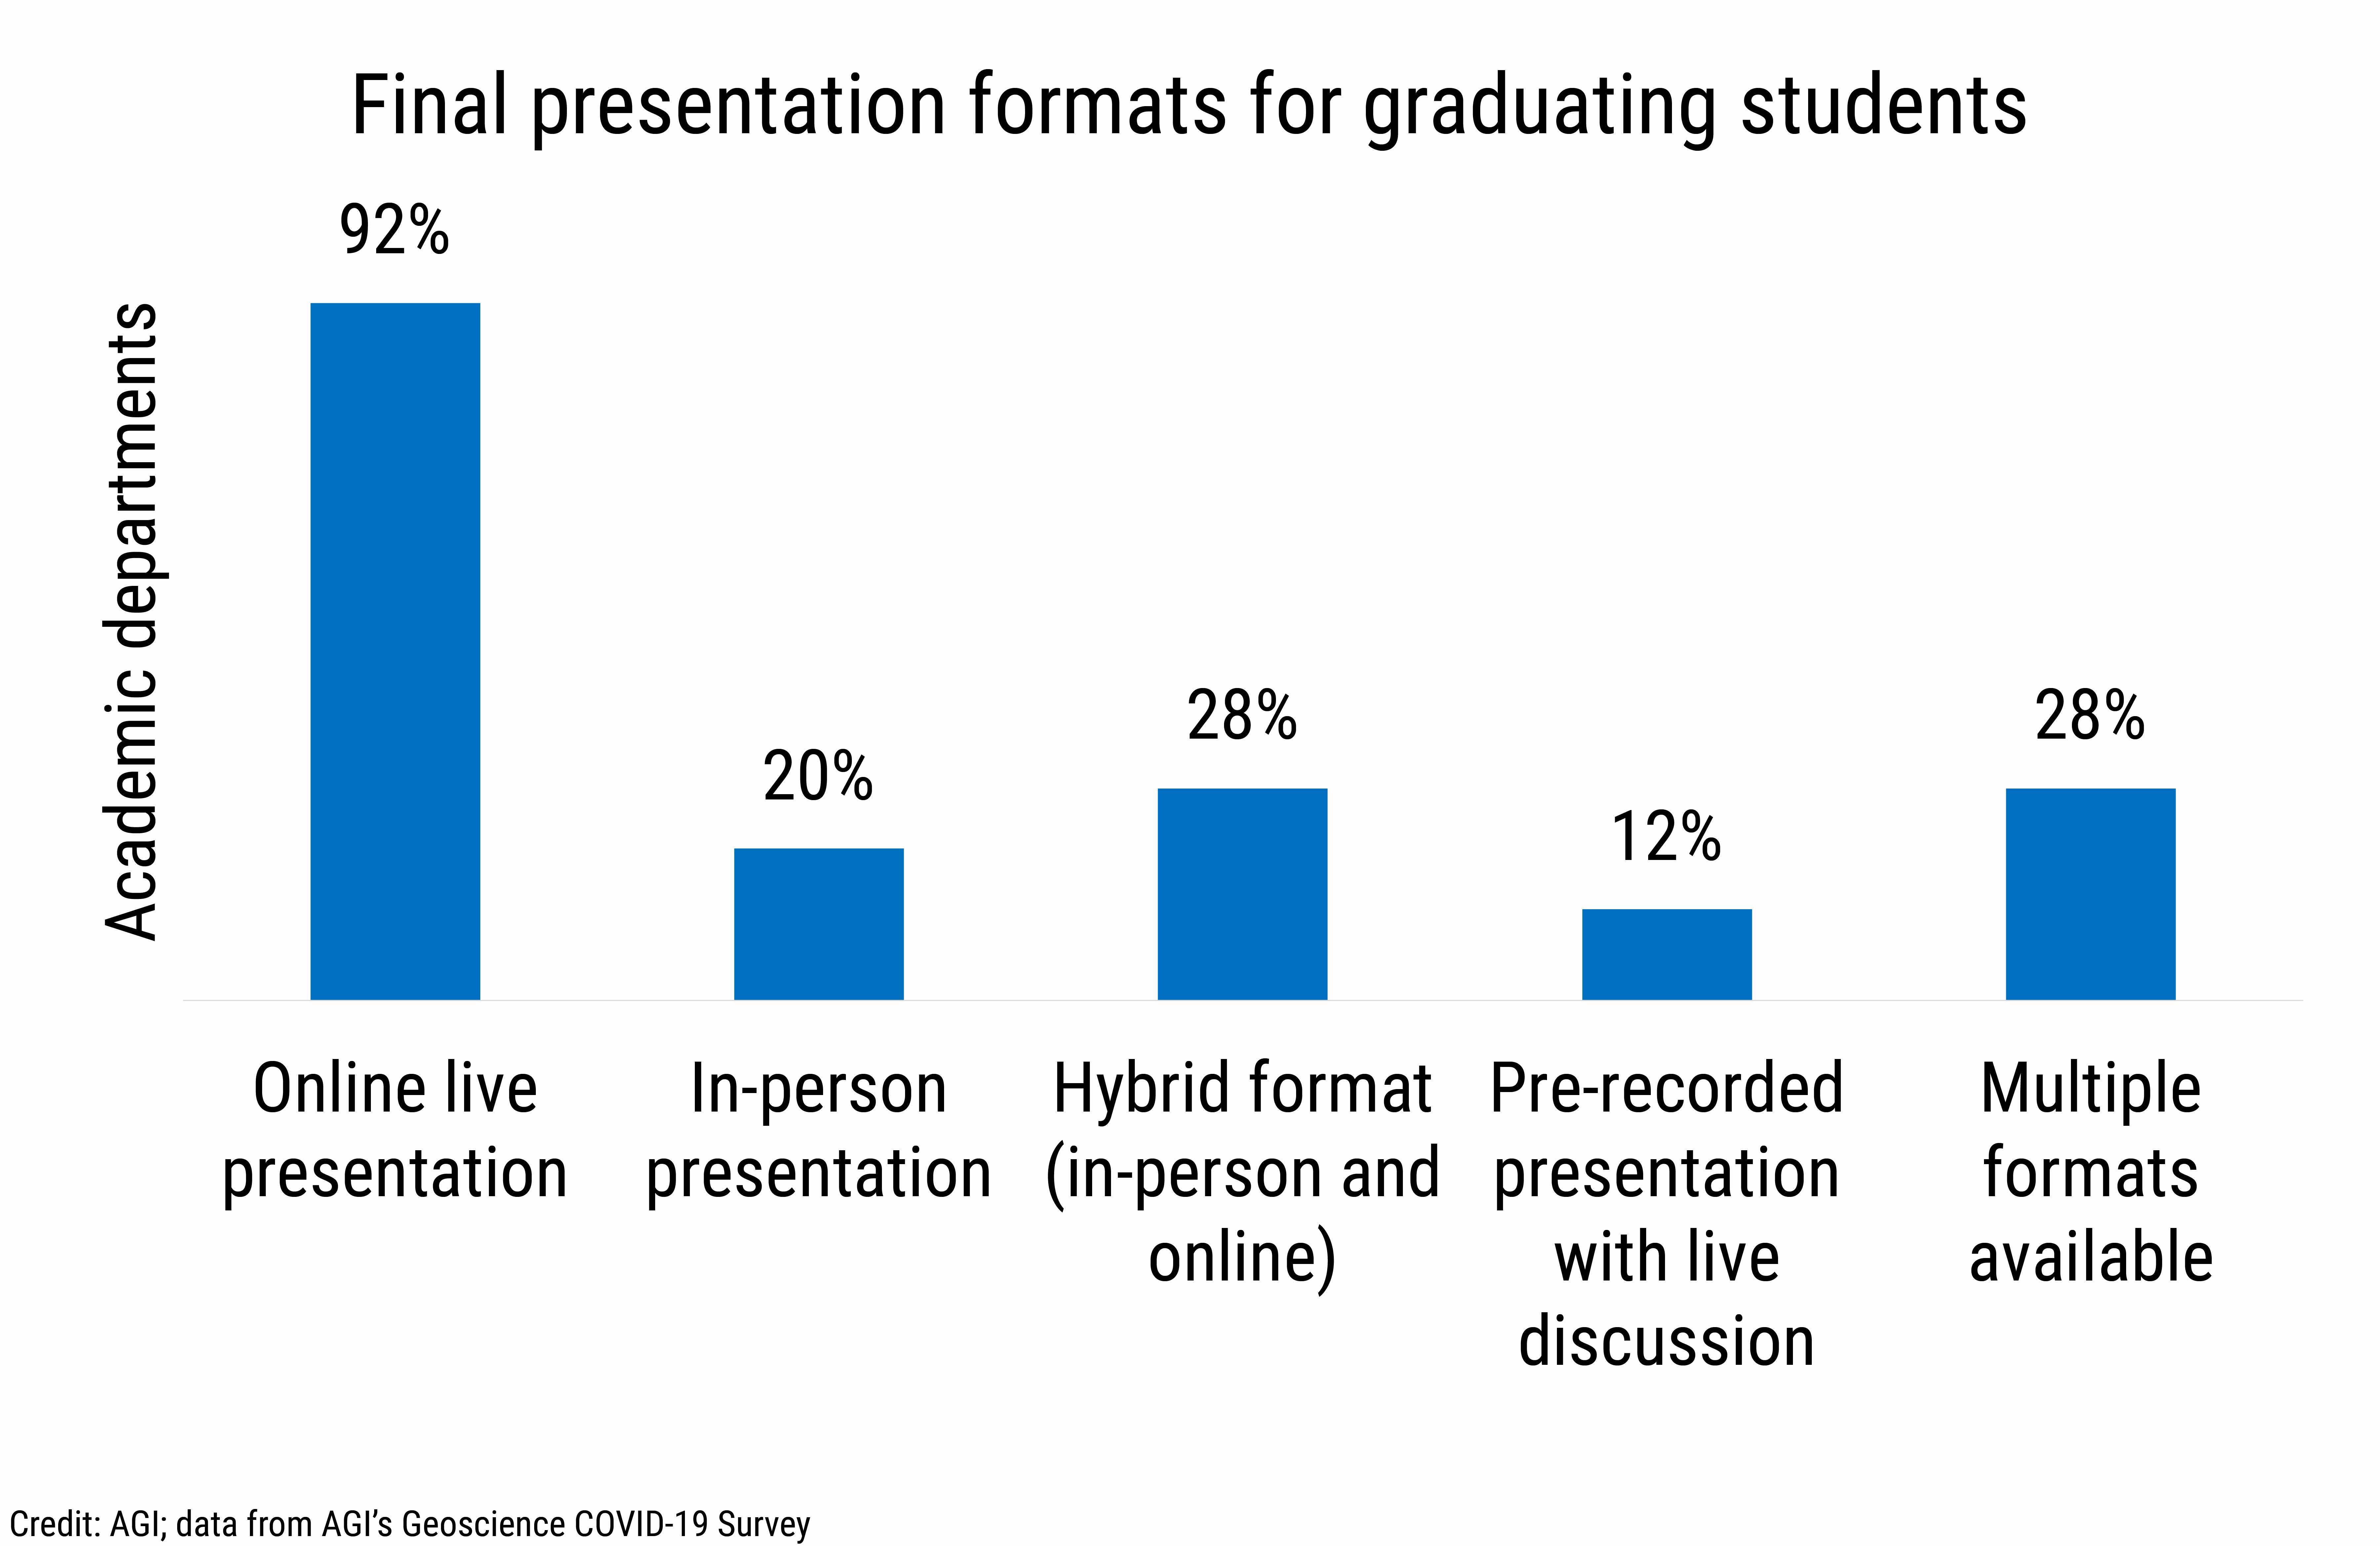 DB_2021-014 chart 09: Final presentation formats for graduating students (Credit: AGI; data from AGI's Geoscience COVID-19 Survey)